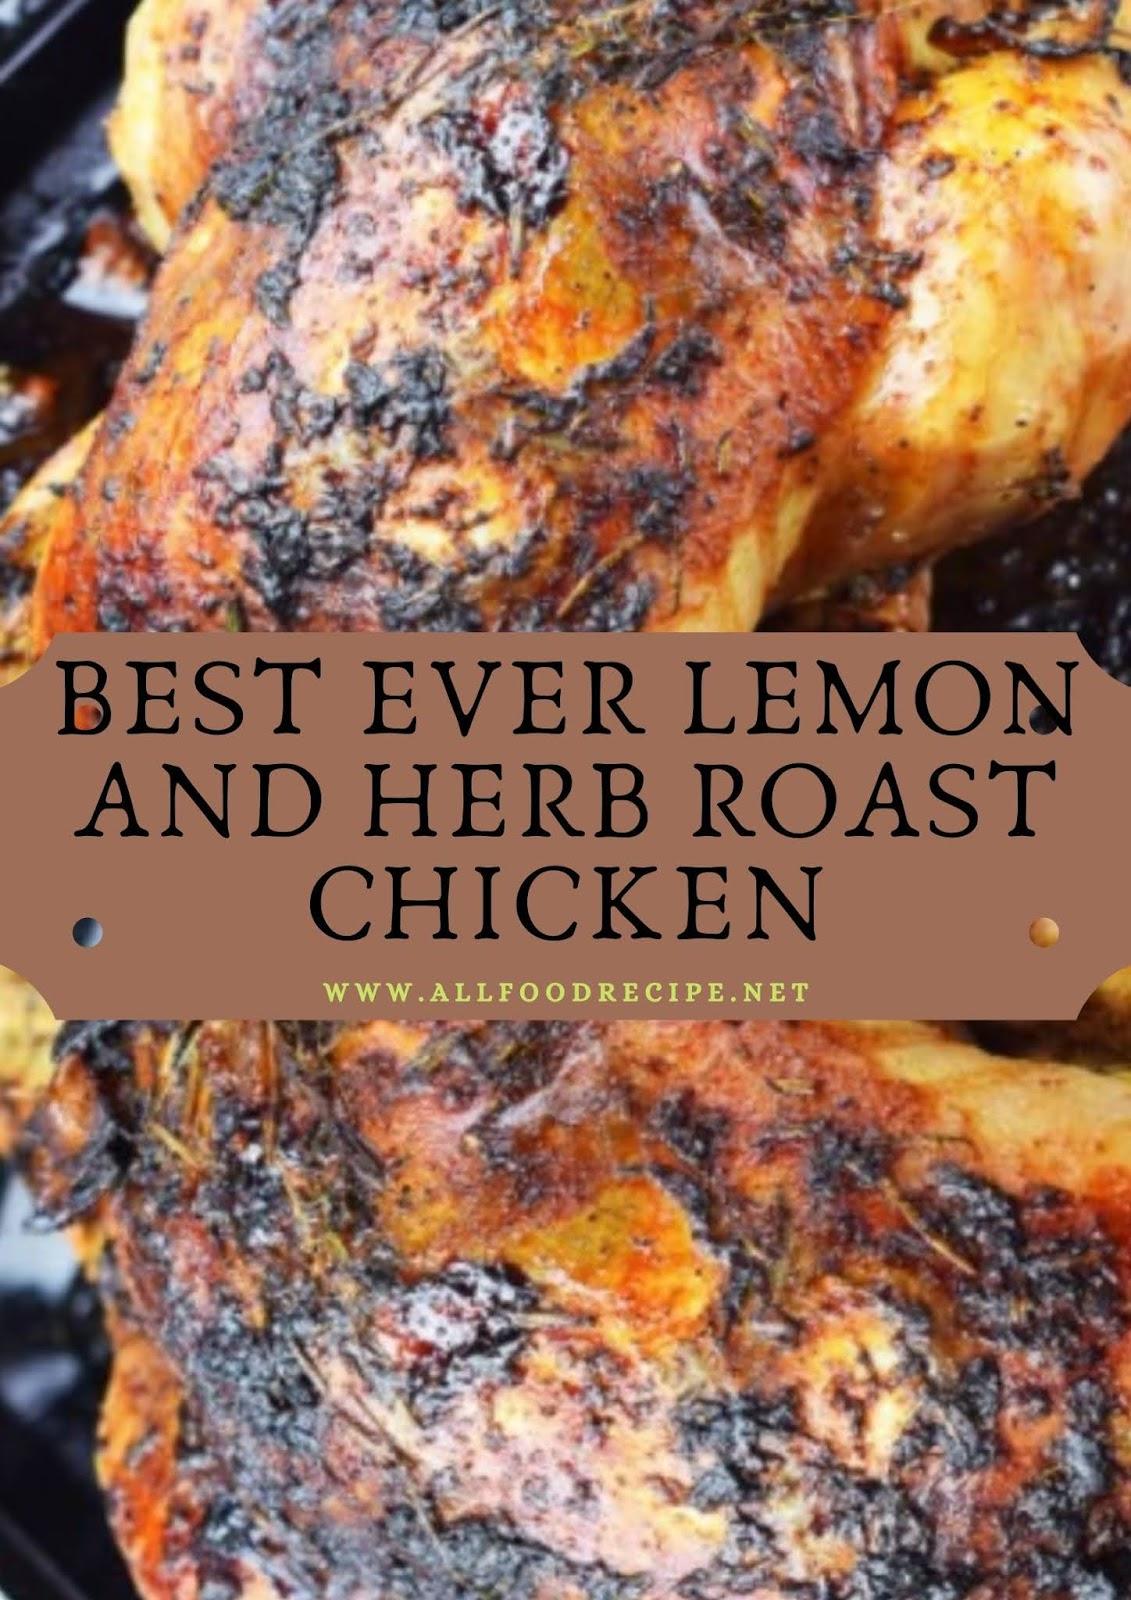 BEST EVER LEMON AND HERB ROAST CHICKEN